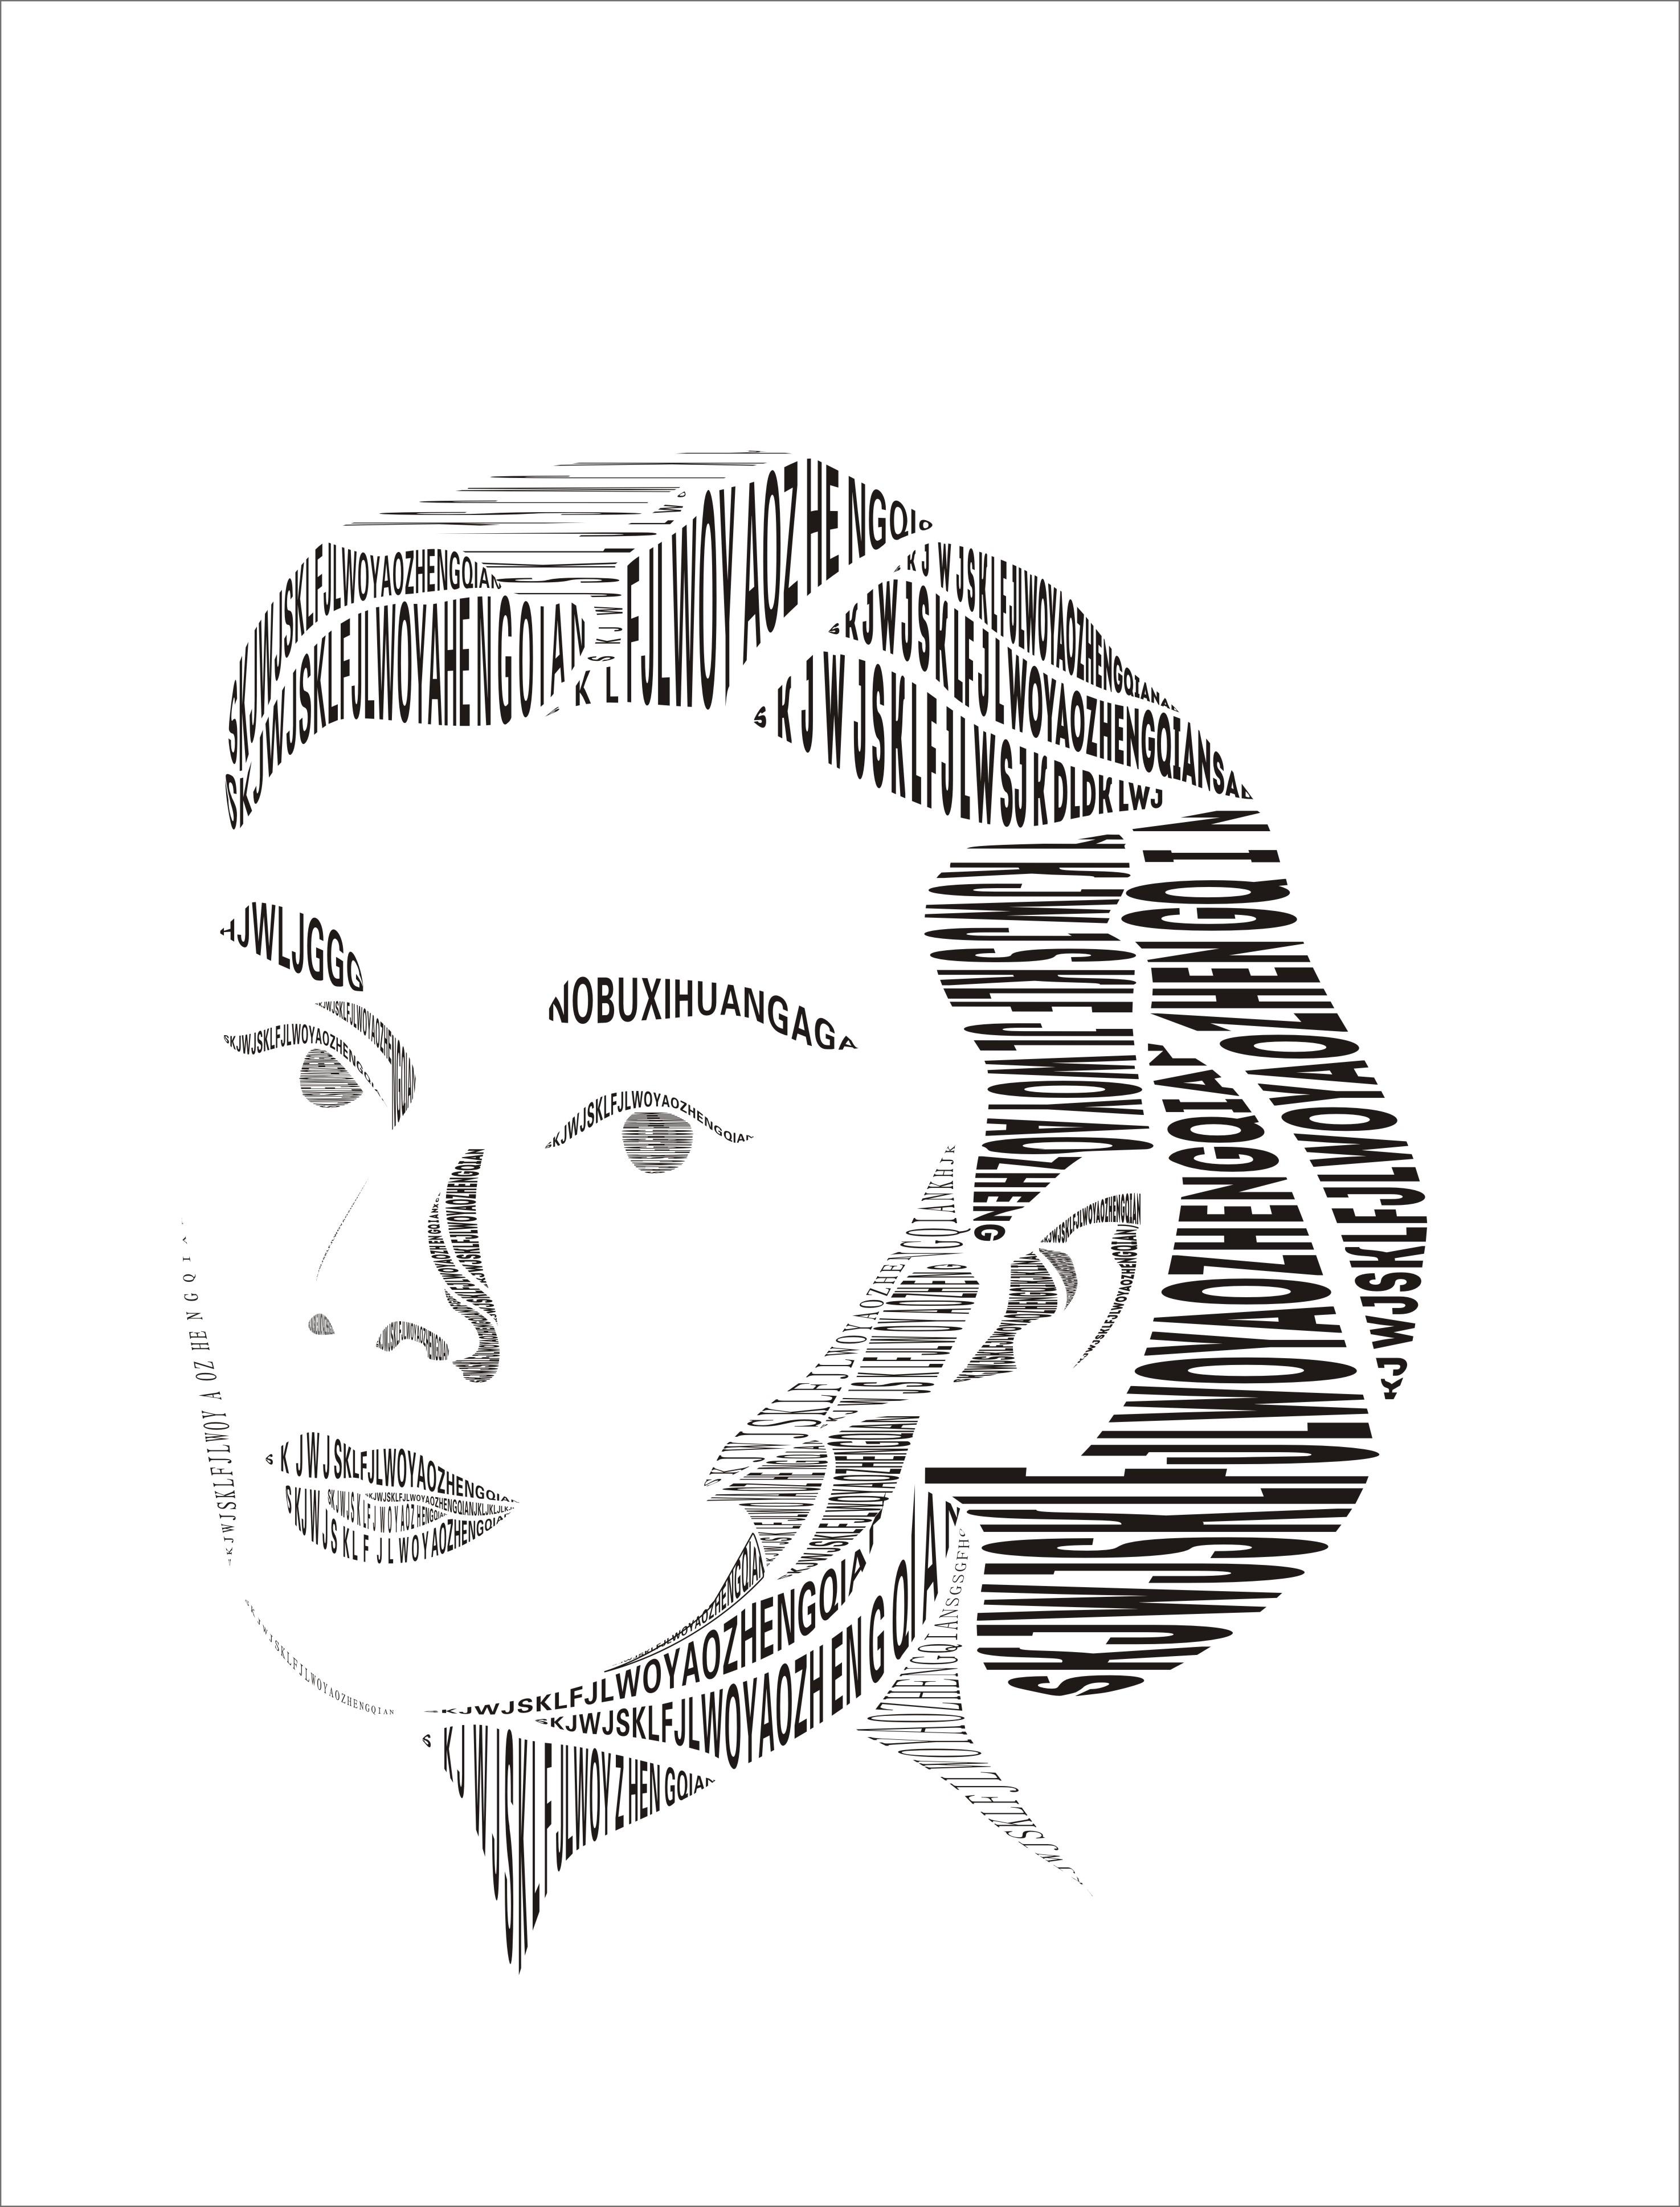 (v9)白班小组 【佛山禅城】20180410平面cdr白班 第四天作业:调和海报